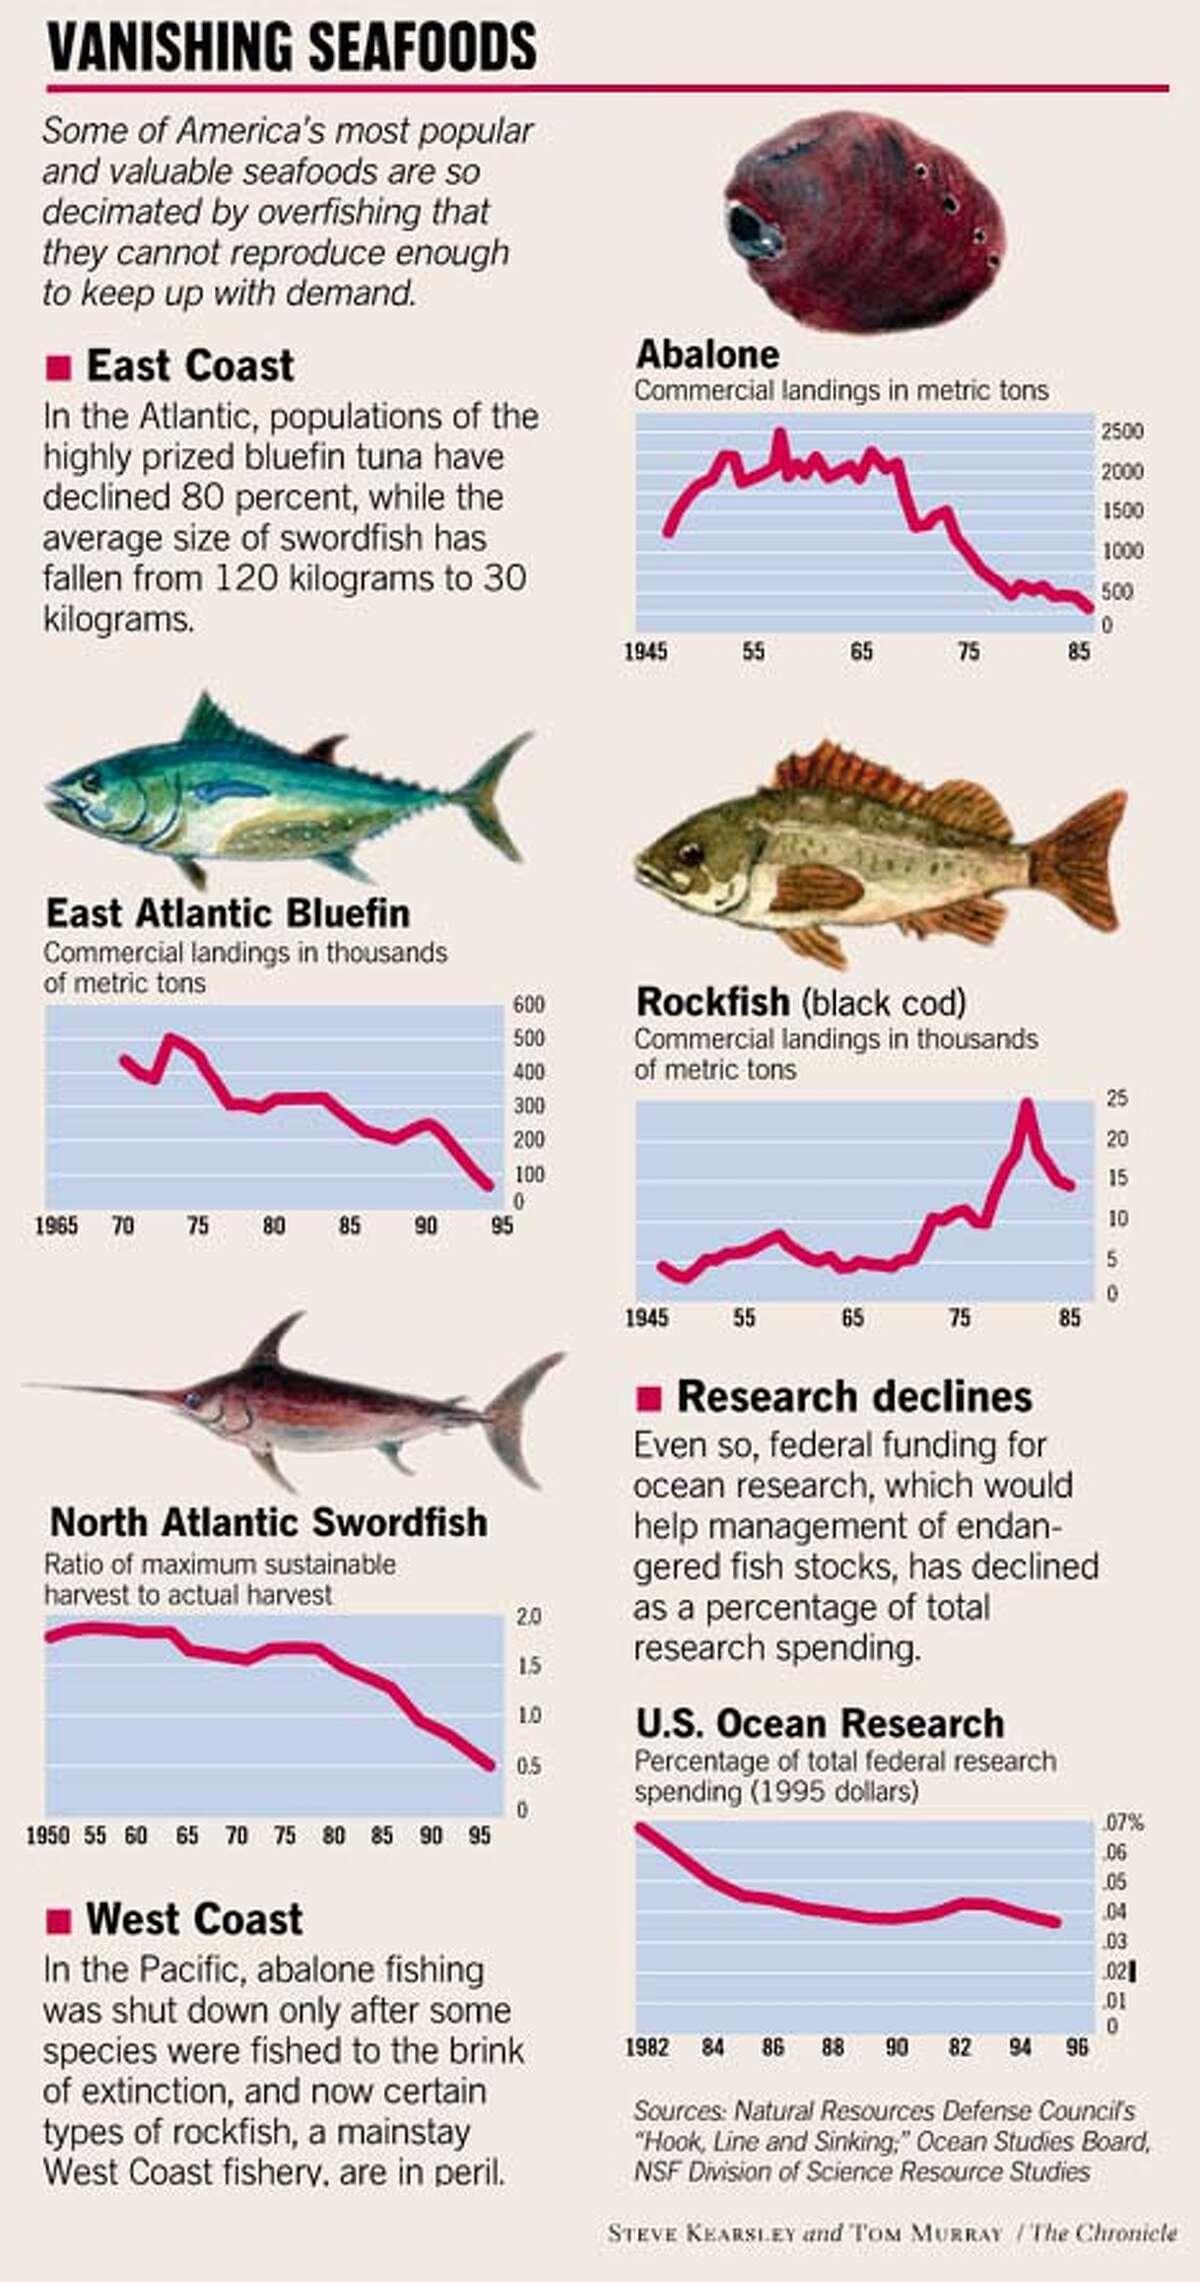 Vanishing Seafoods. Chronicle illustration by Steve Kearsley and Tom Murray